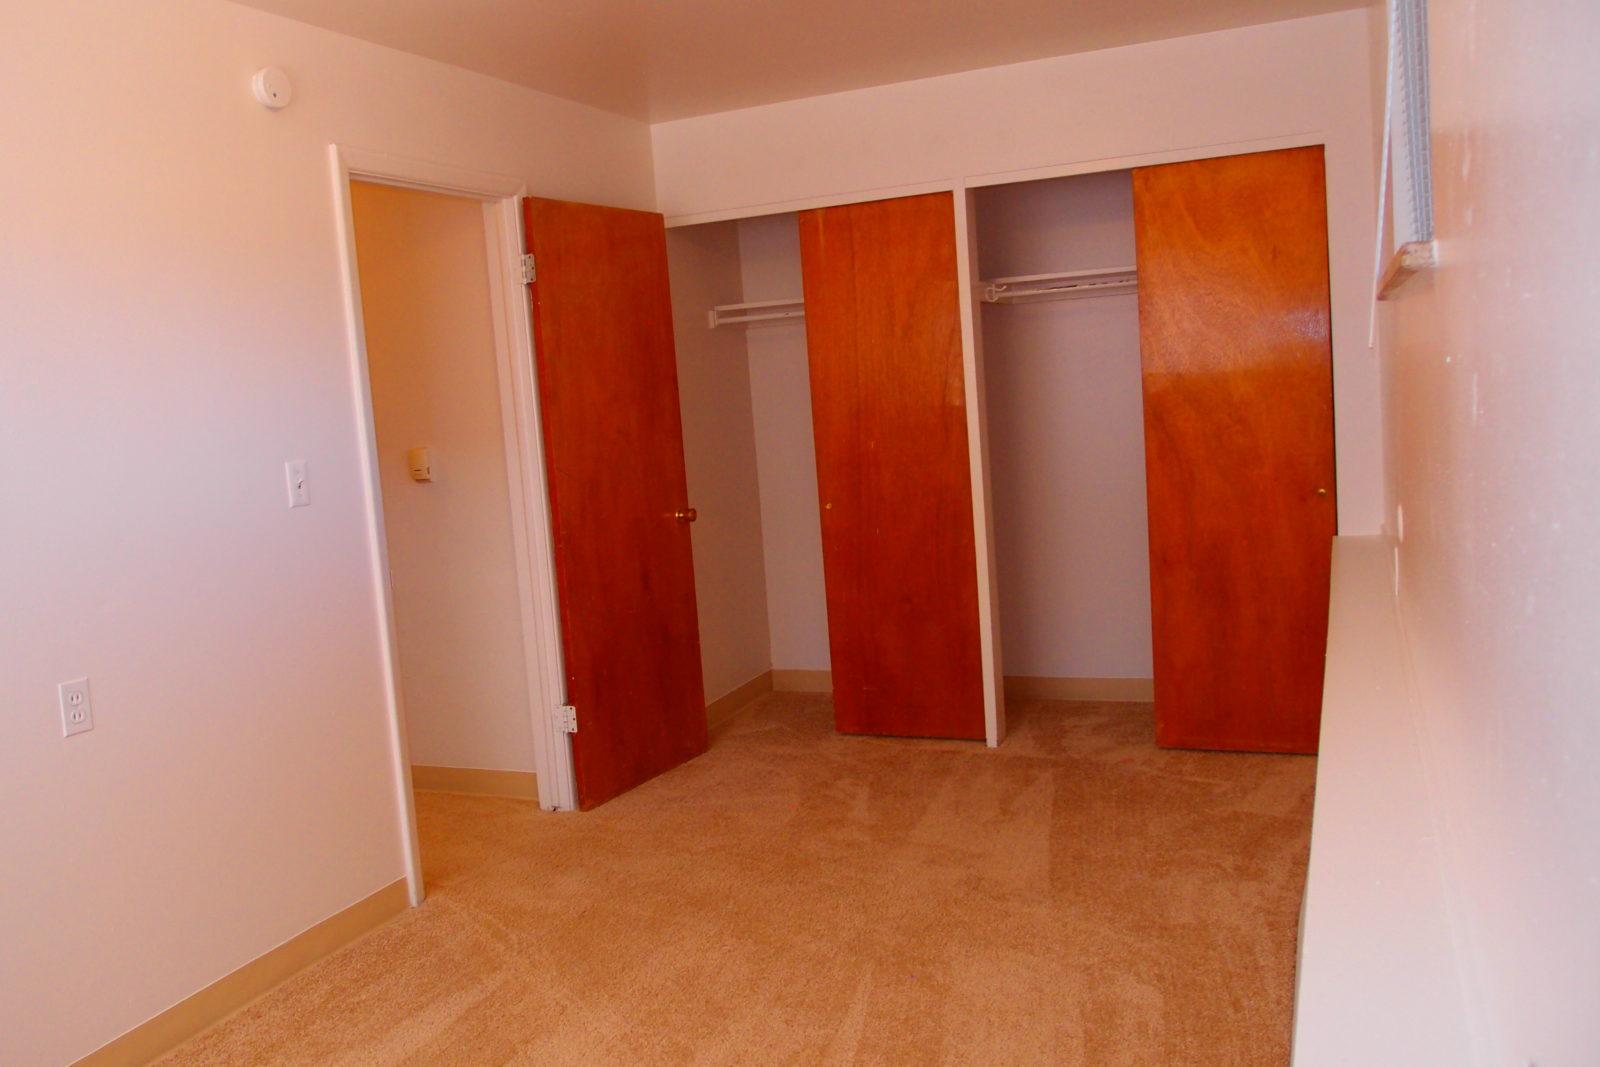 Bedroom One Closet